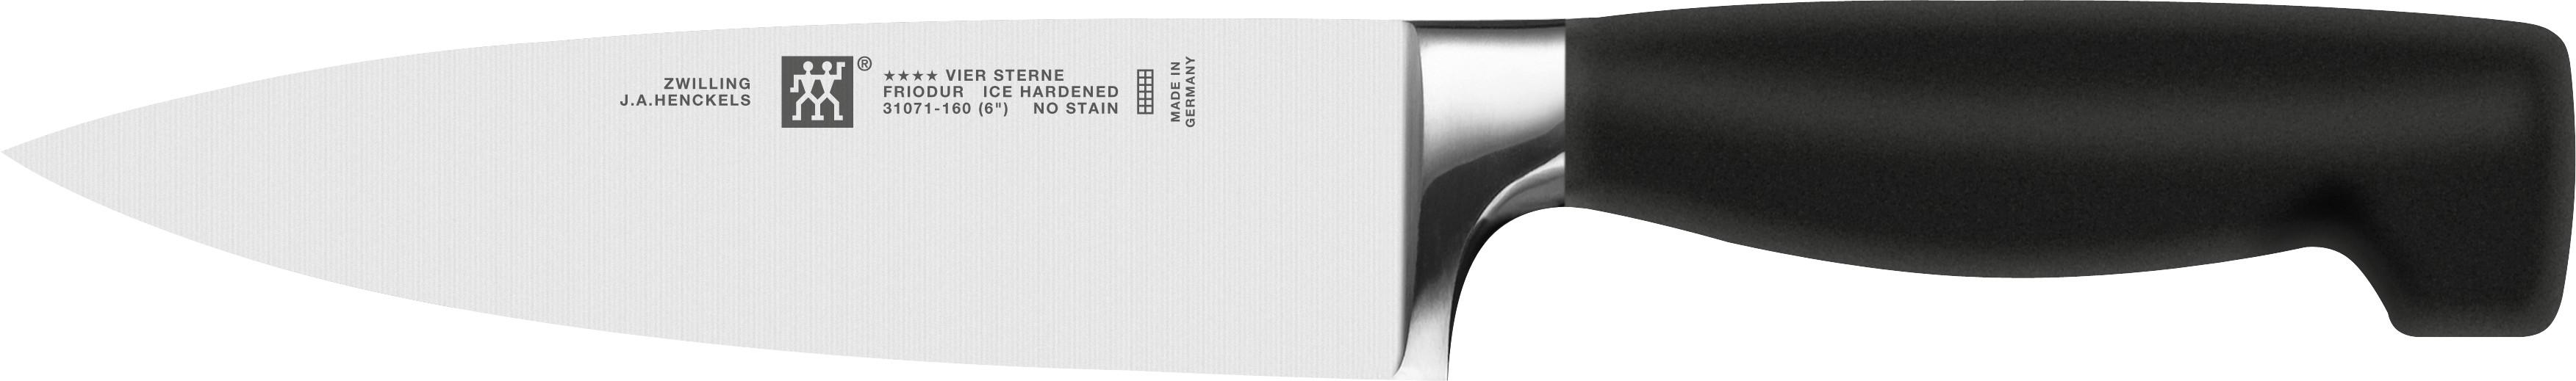 online shop vier sterne kochmesser 160 mm bis 260 mm kaufen. Black Bedroom Furniture Sets. Home Design Ideas